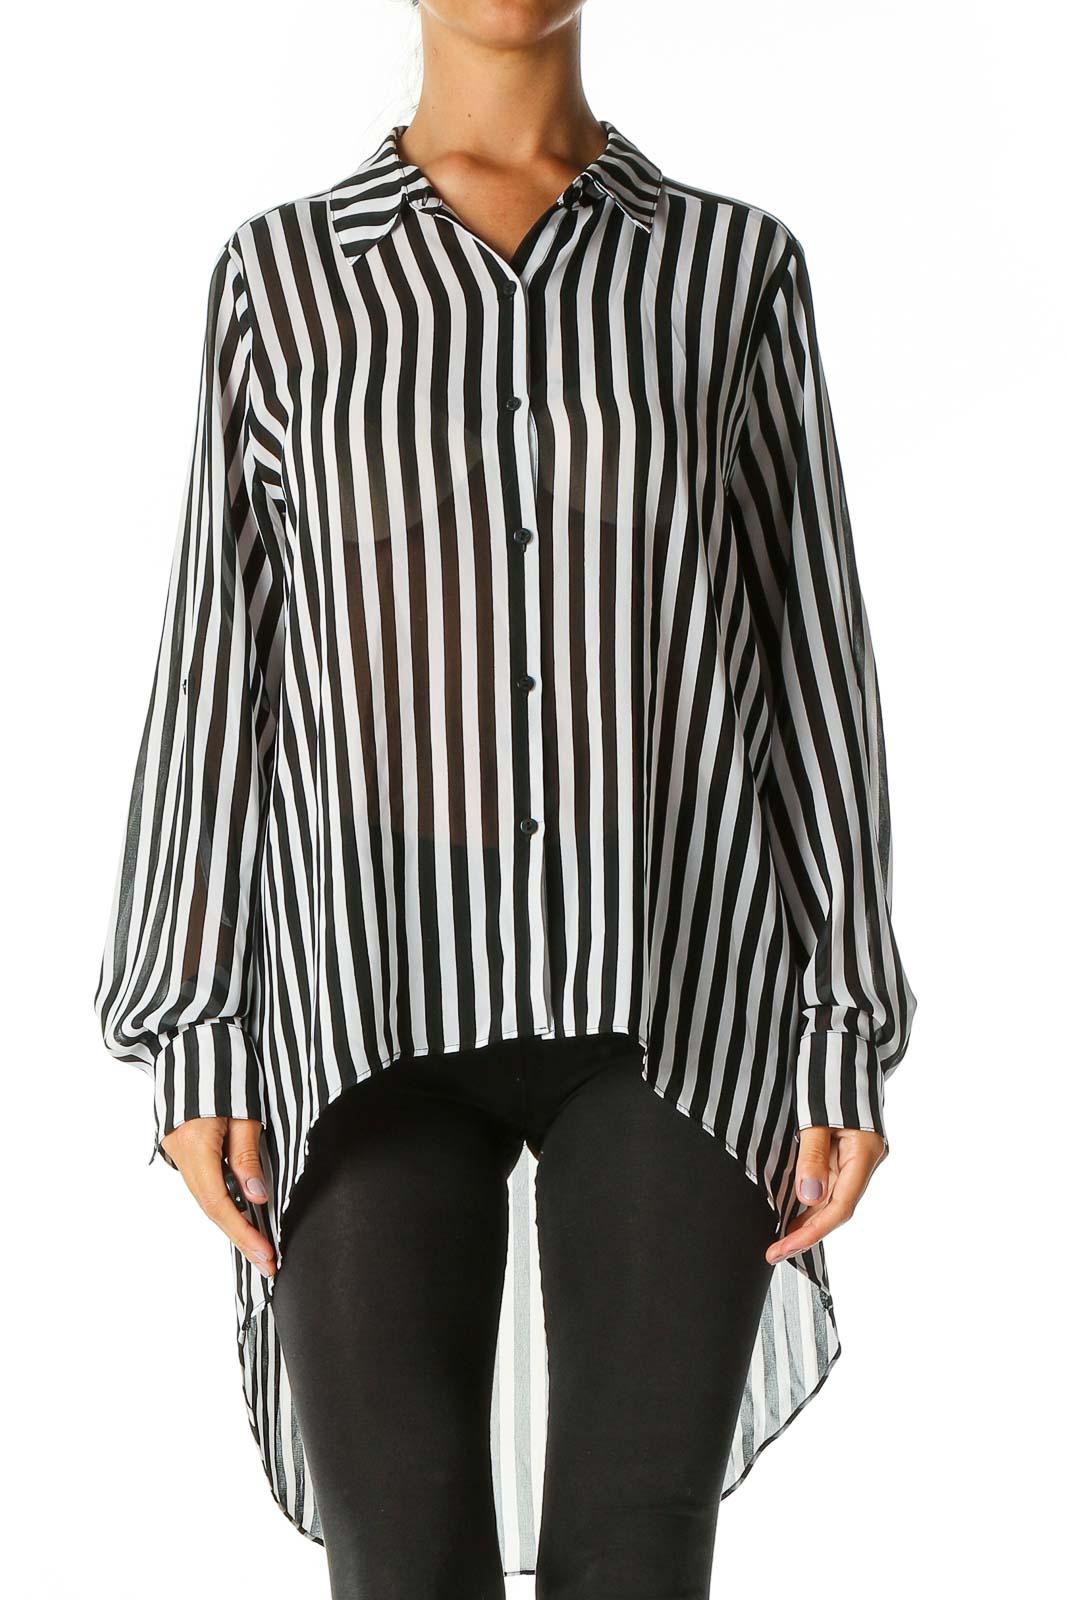 Black Striped Formal Shirt Front